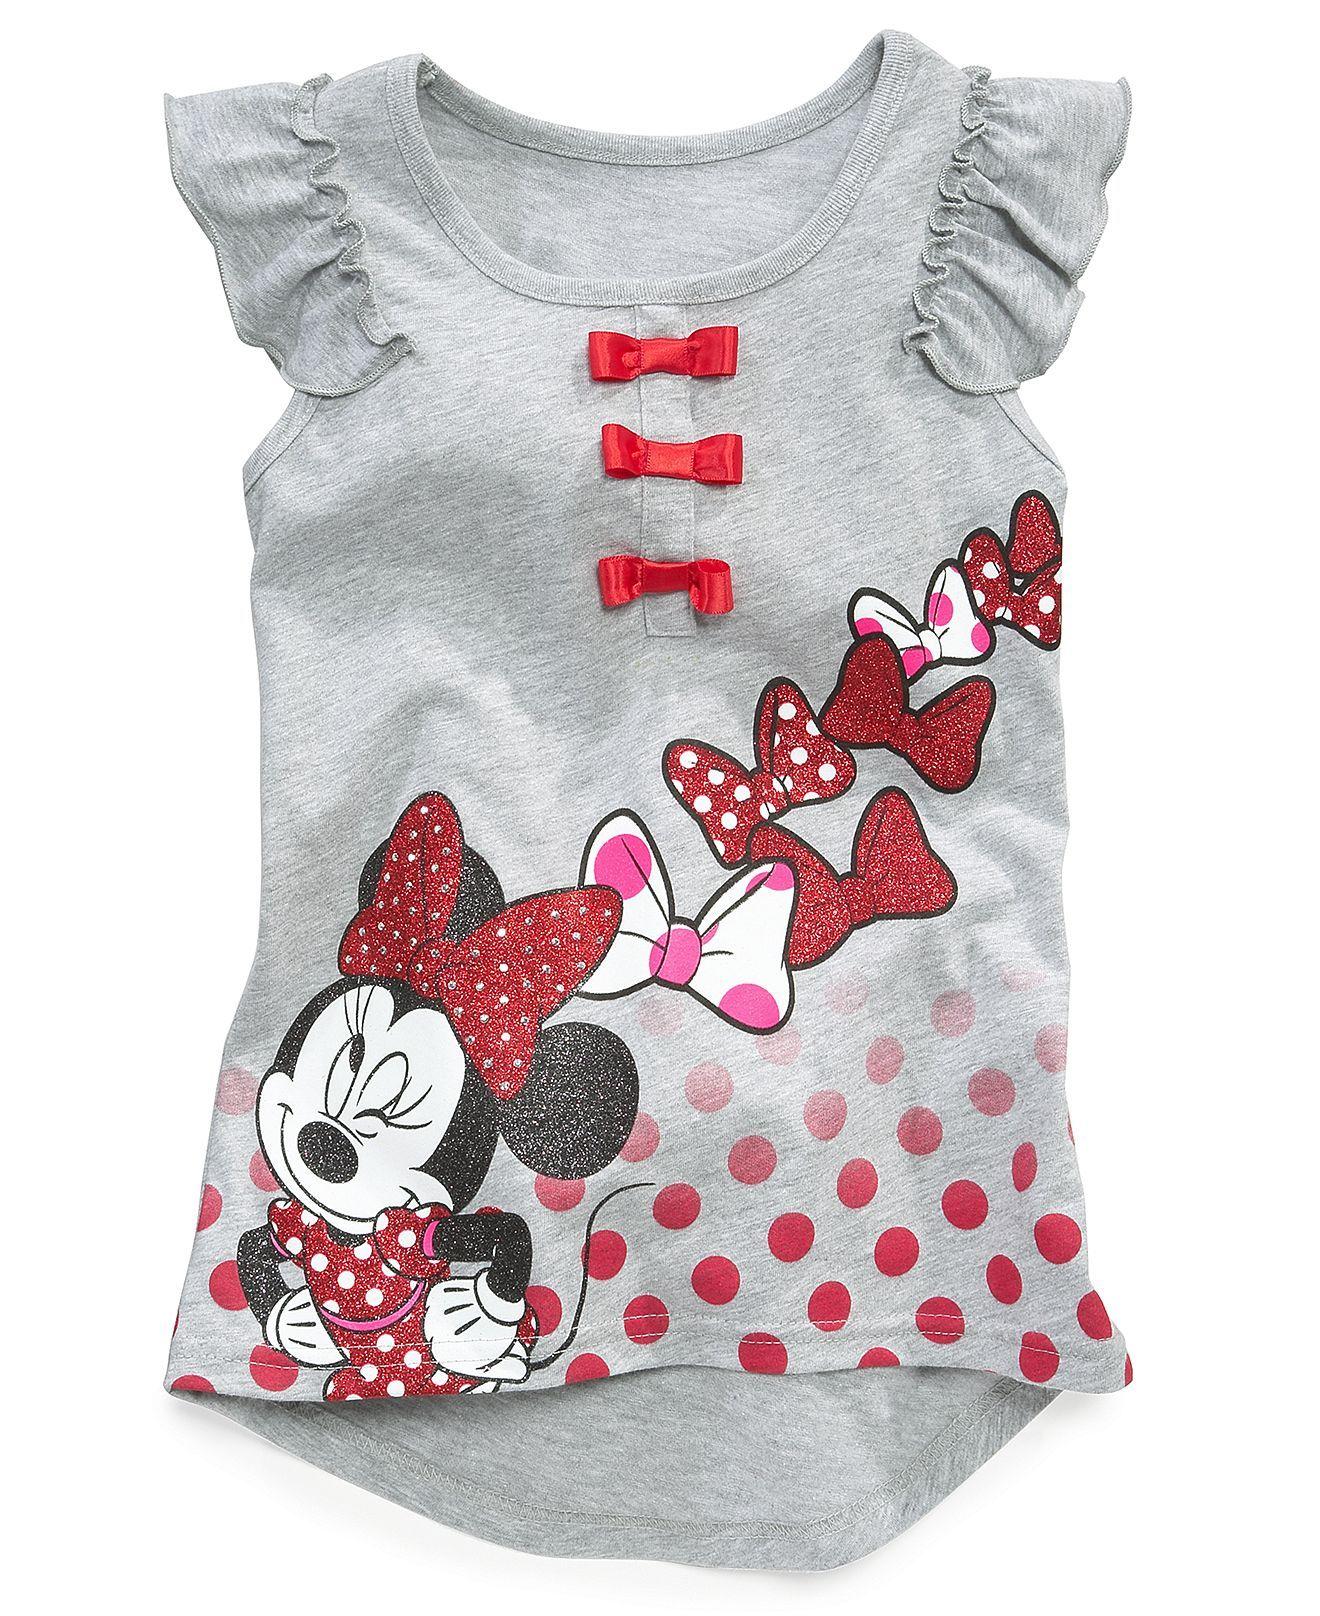 77a38ef6b818 Disney Kids Shirt